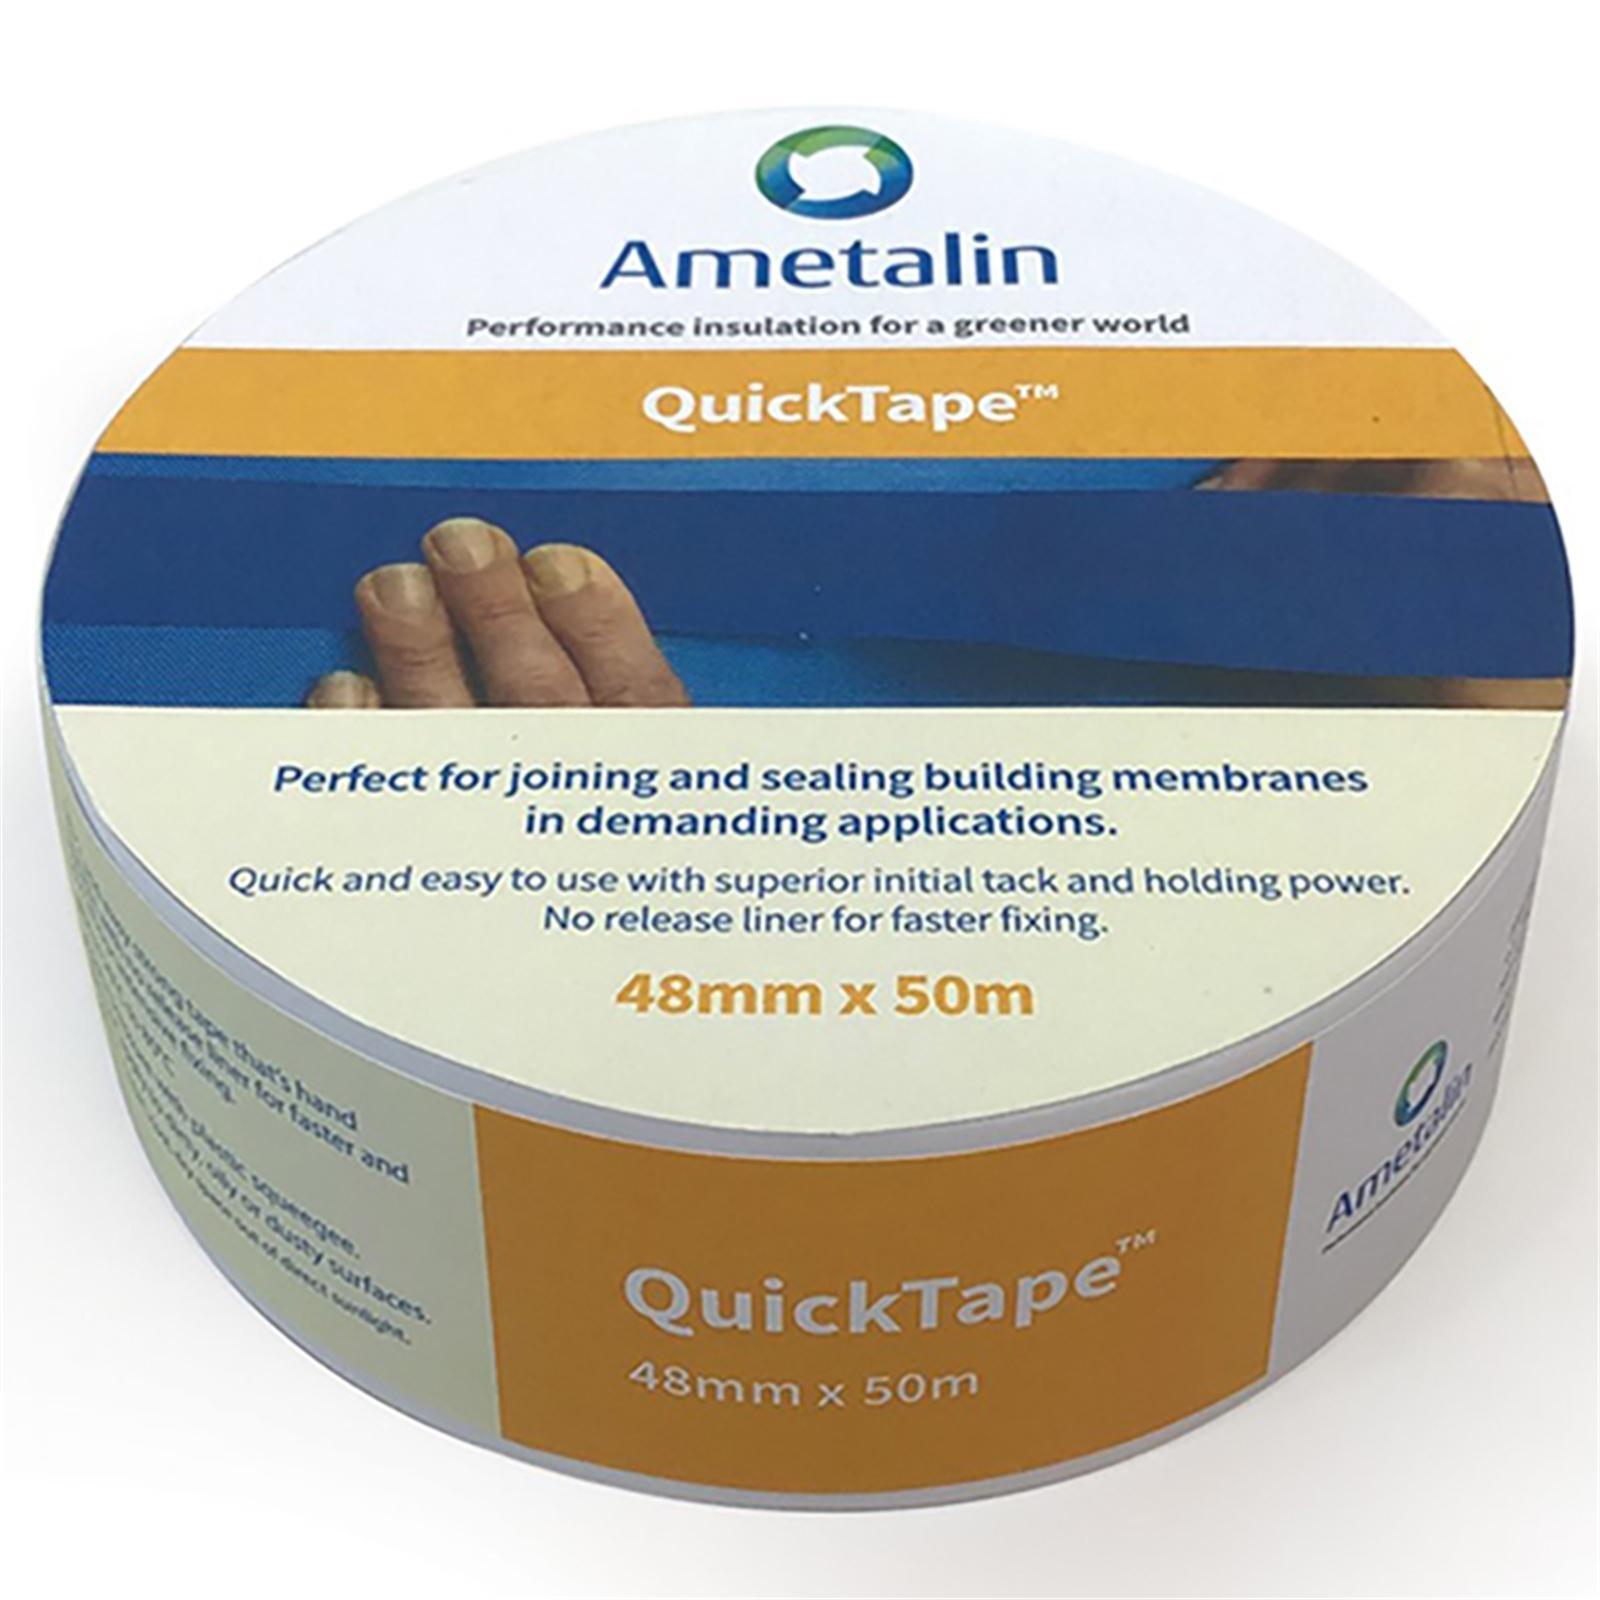 Ametalin 48mm x 50m QuickTape